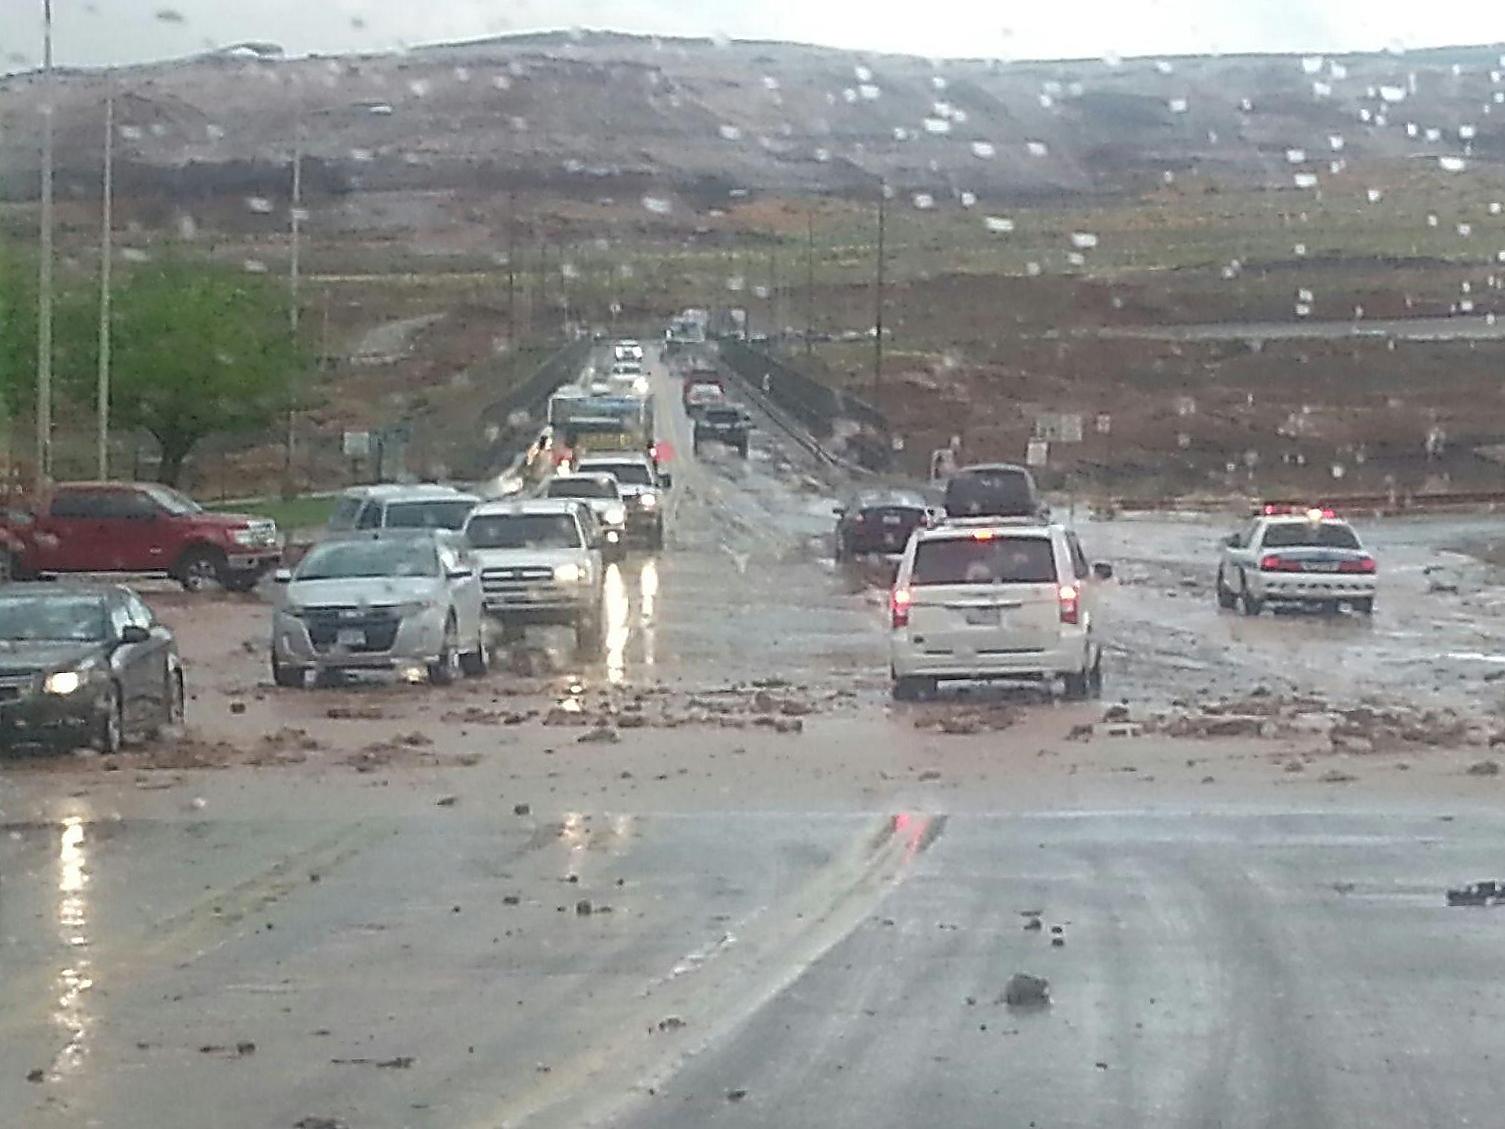 Heavy rain, mudflow and large rocks slow traffic on US 89.